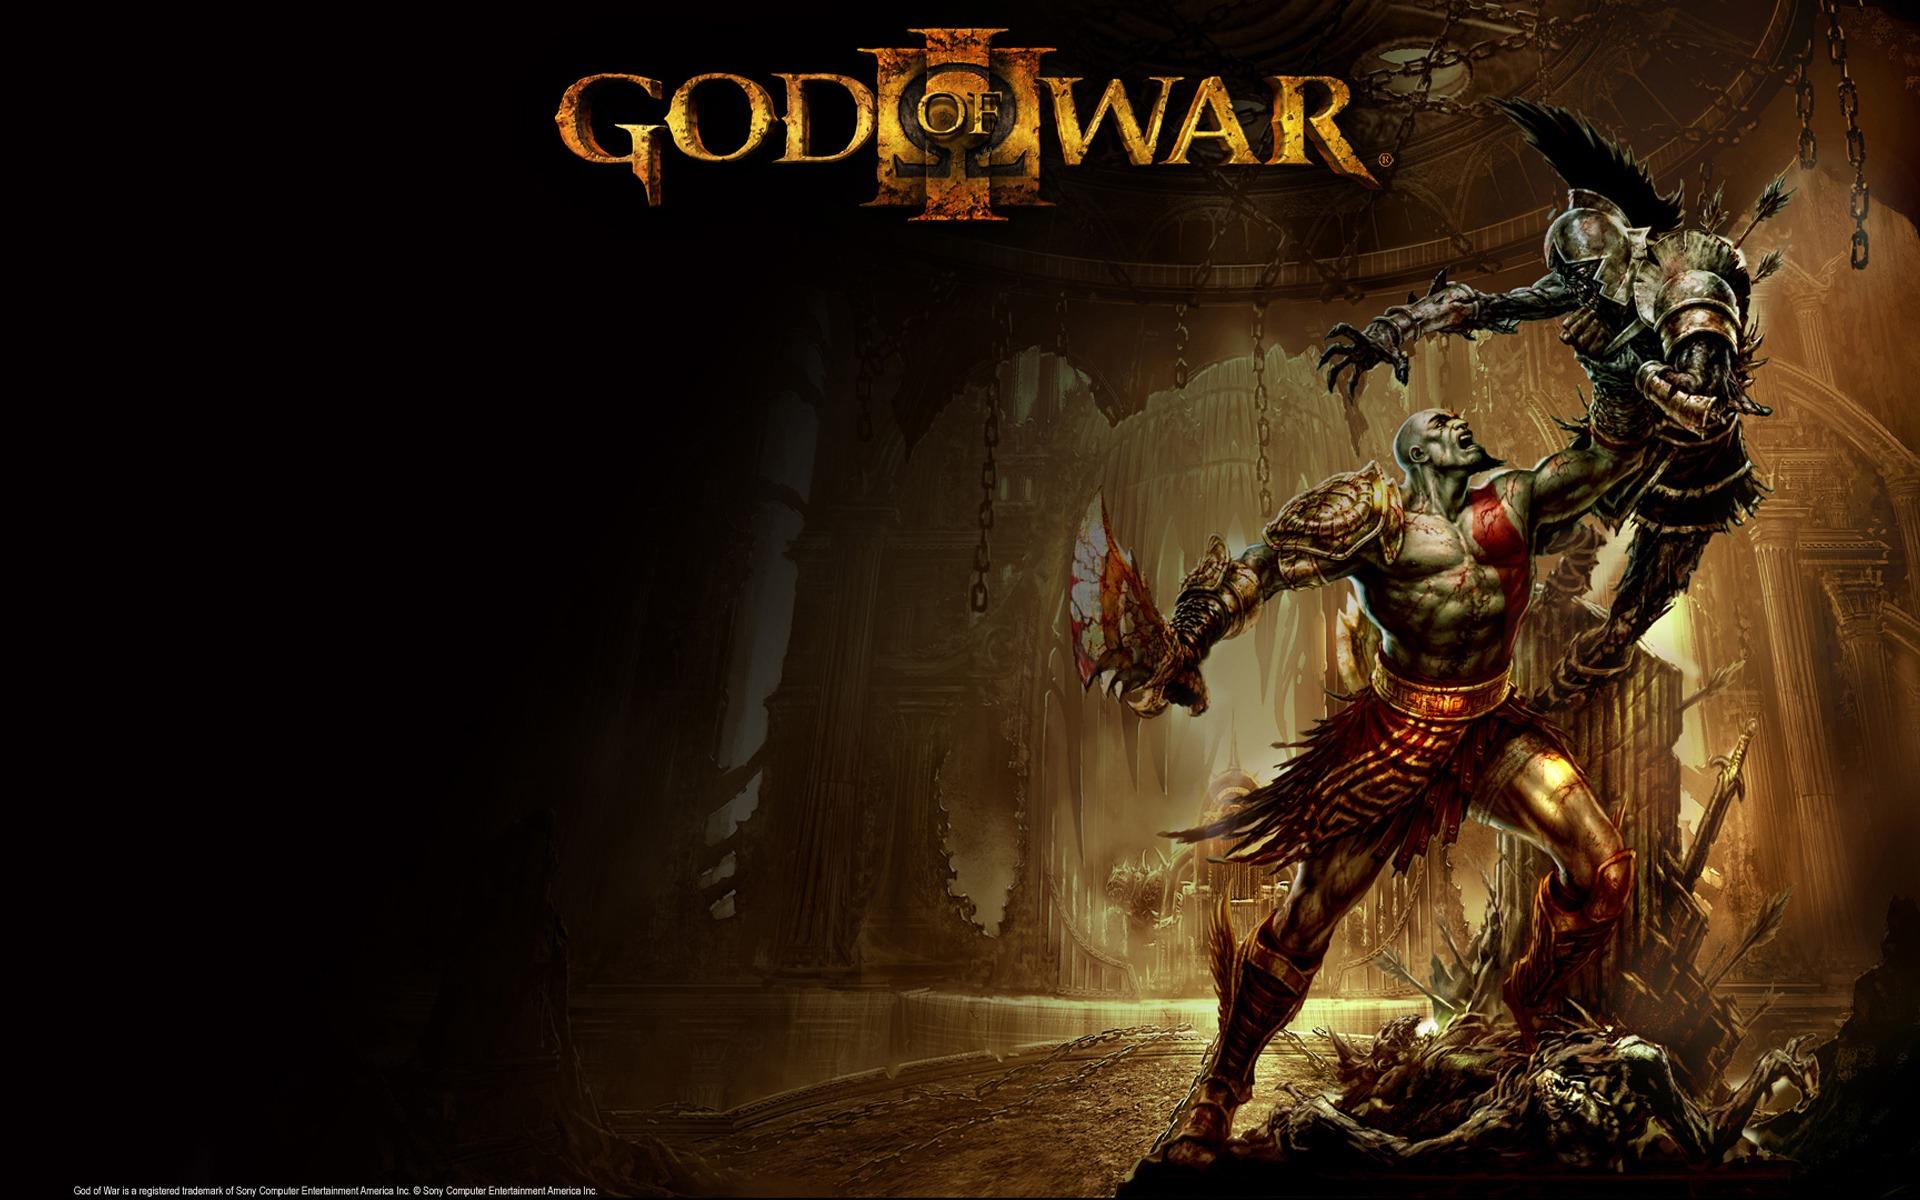 god of war 3 wallpaper god of war games wallpapers in jpg format for